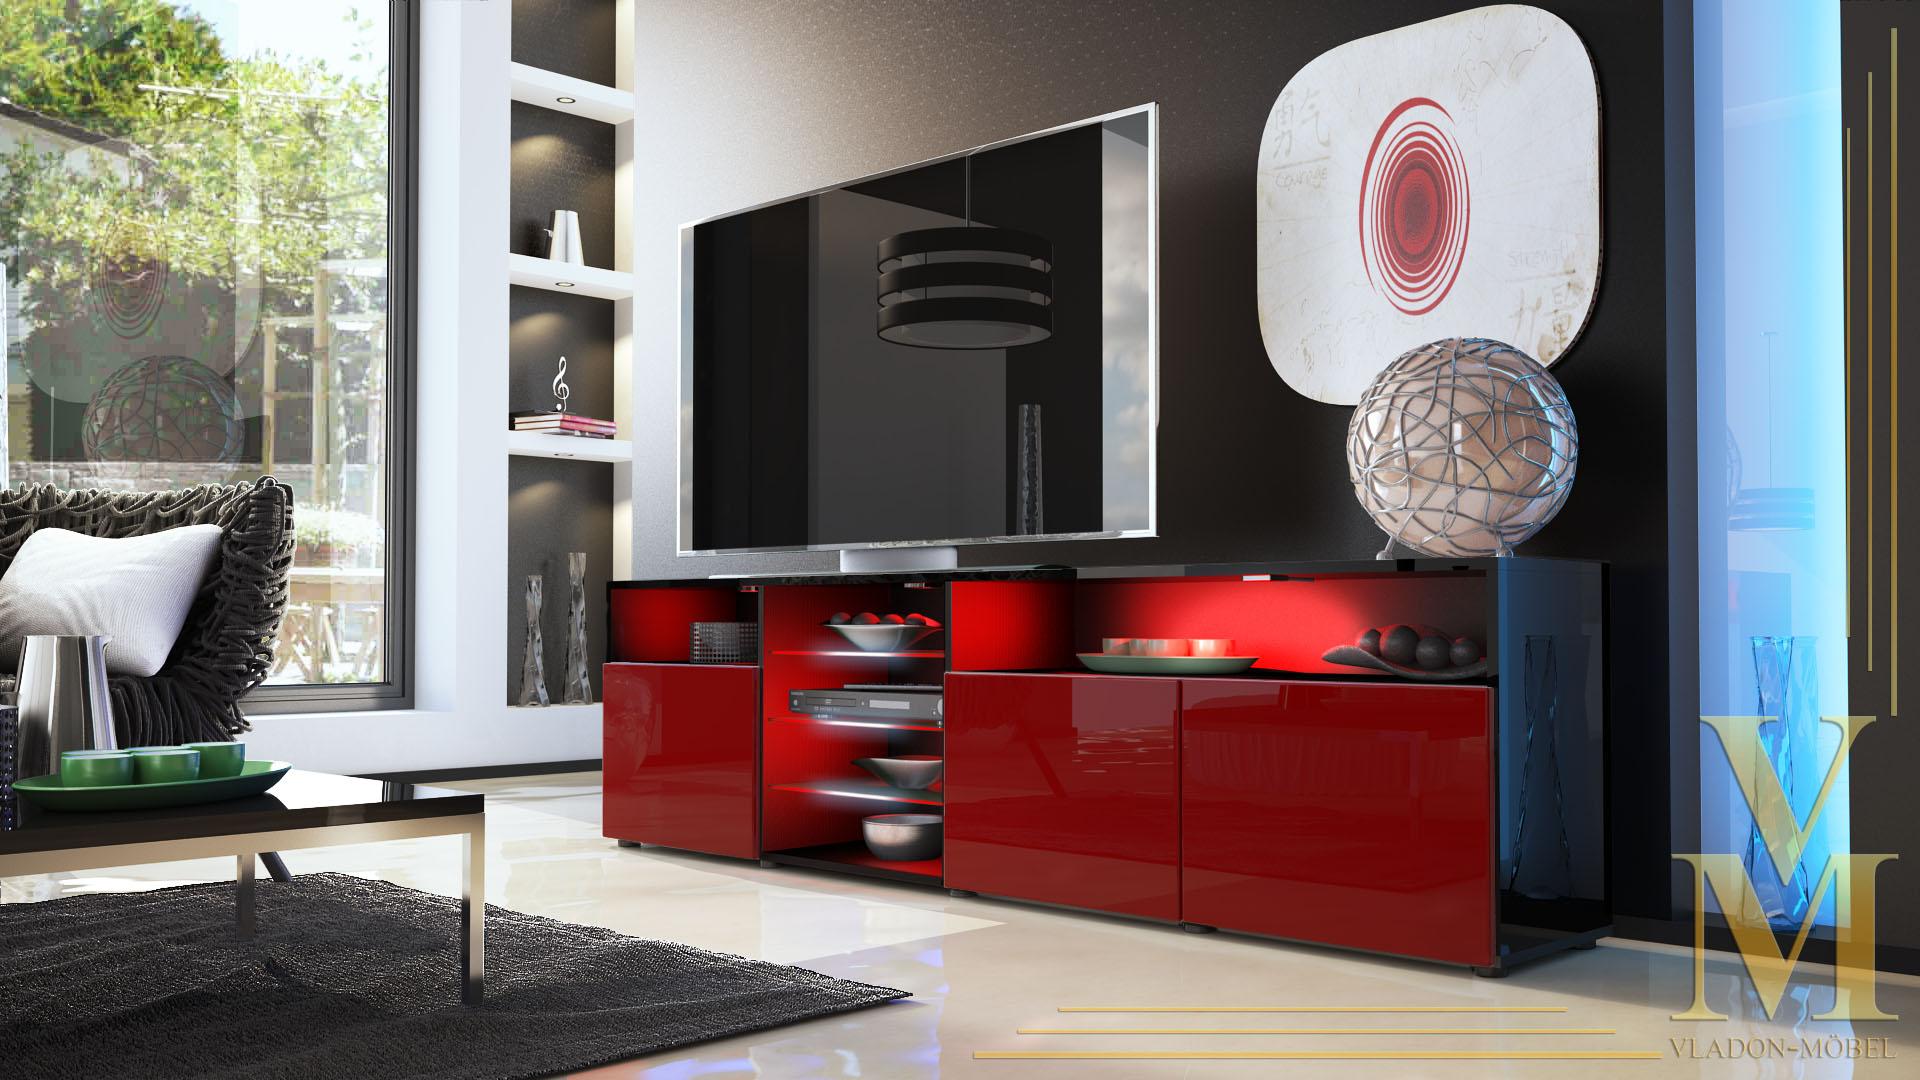 lowboard sideboard tv board tisch rack granada v2 schwarz hochglanz. Black Bedroom Furniture Sets. Home Design Ideas